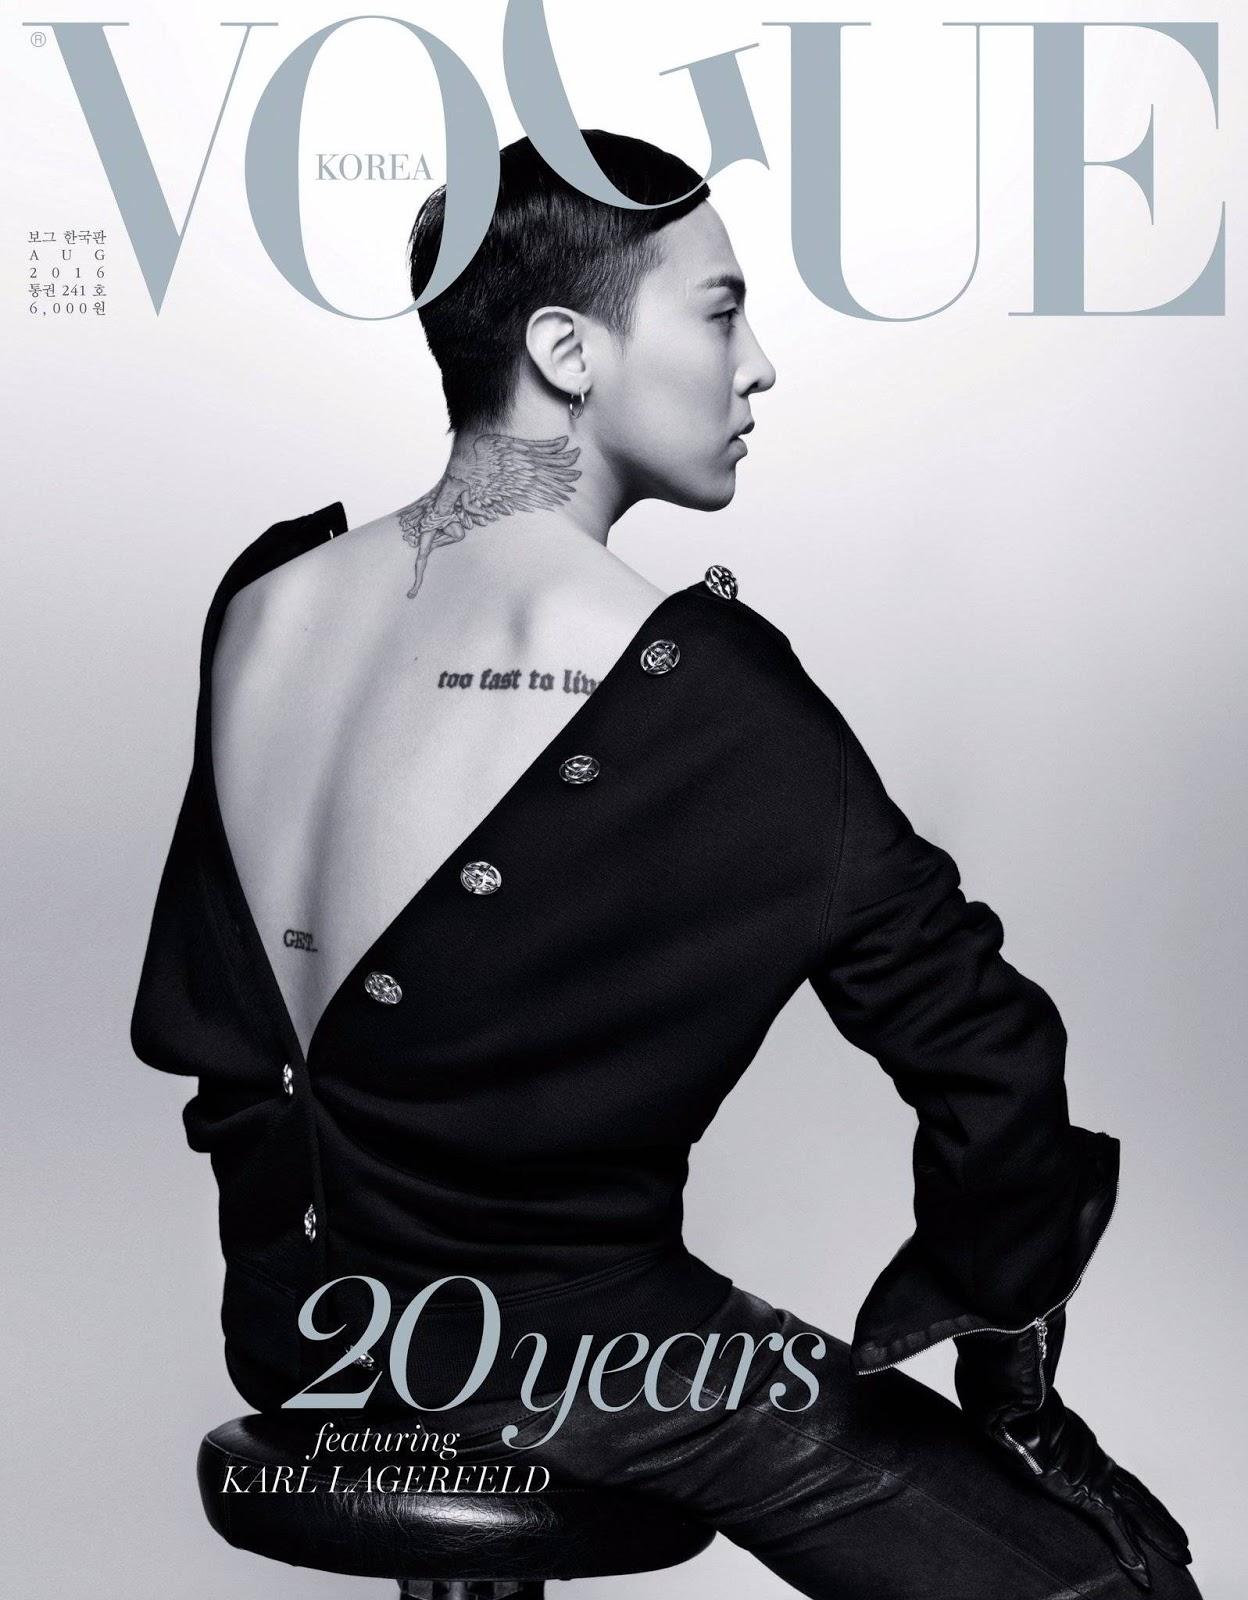 G Dragon Vogue Korea August 2016 Covers Karl Lagerfeld